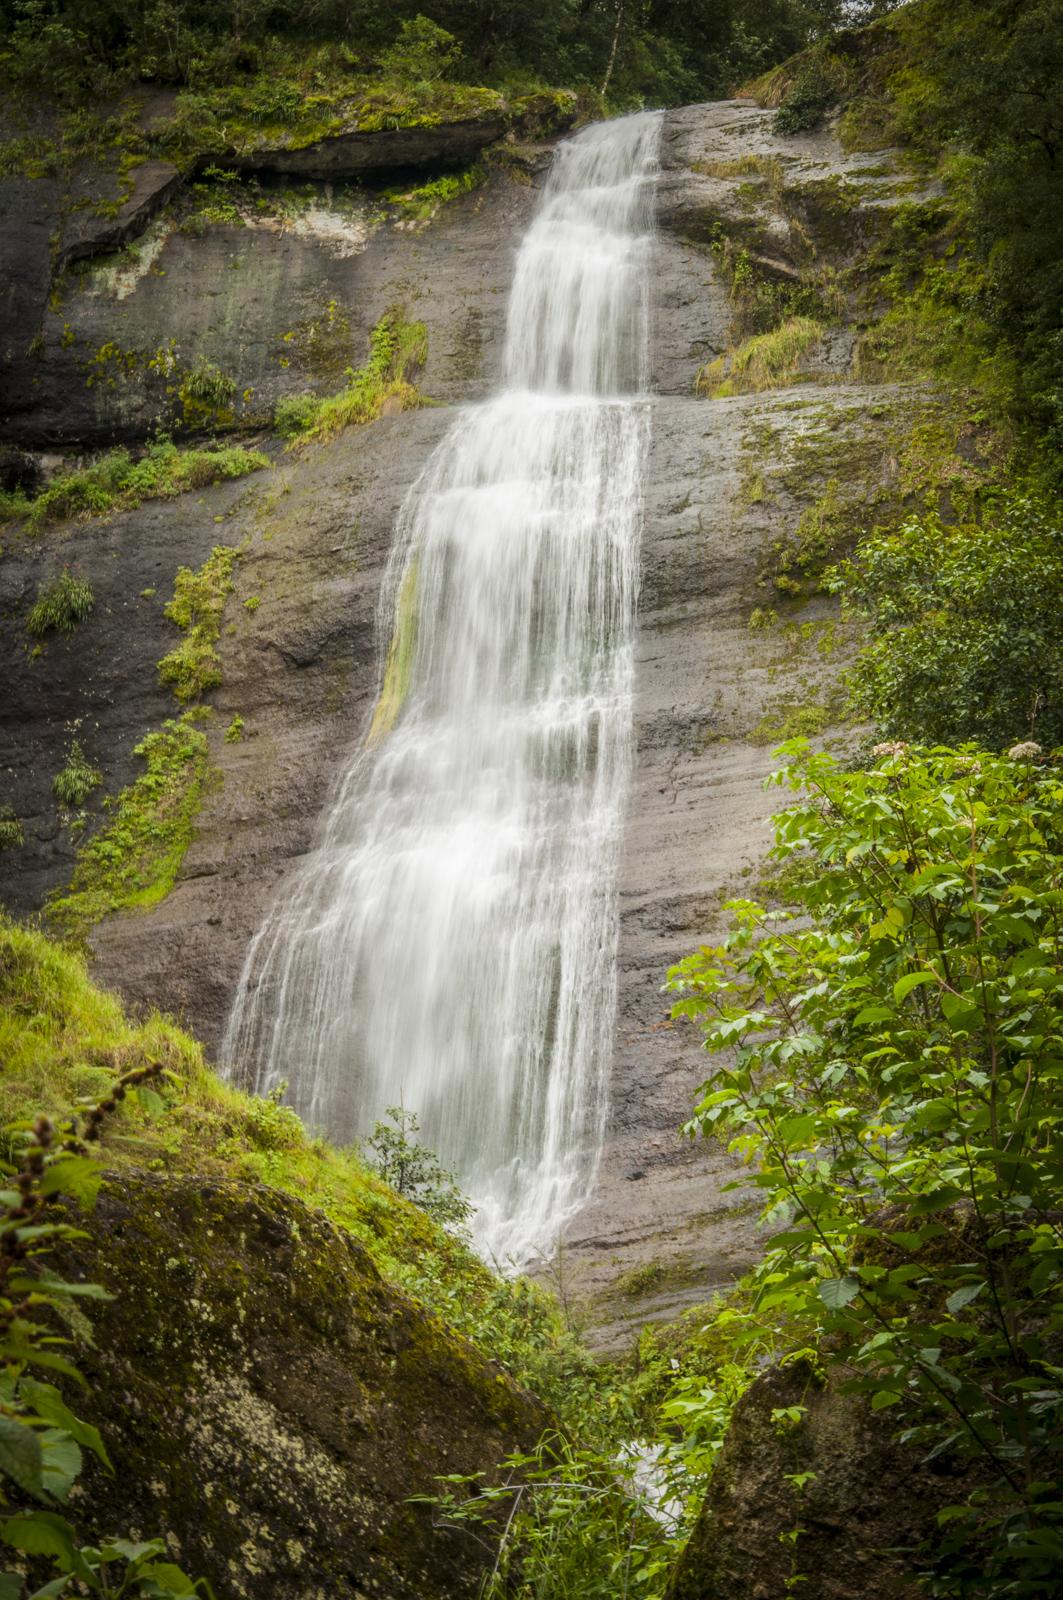 vista de la cascada Velo de Novia en Zacapoaxtla